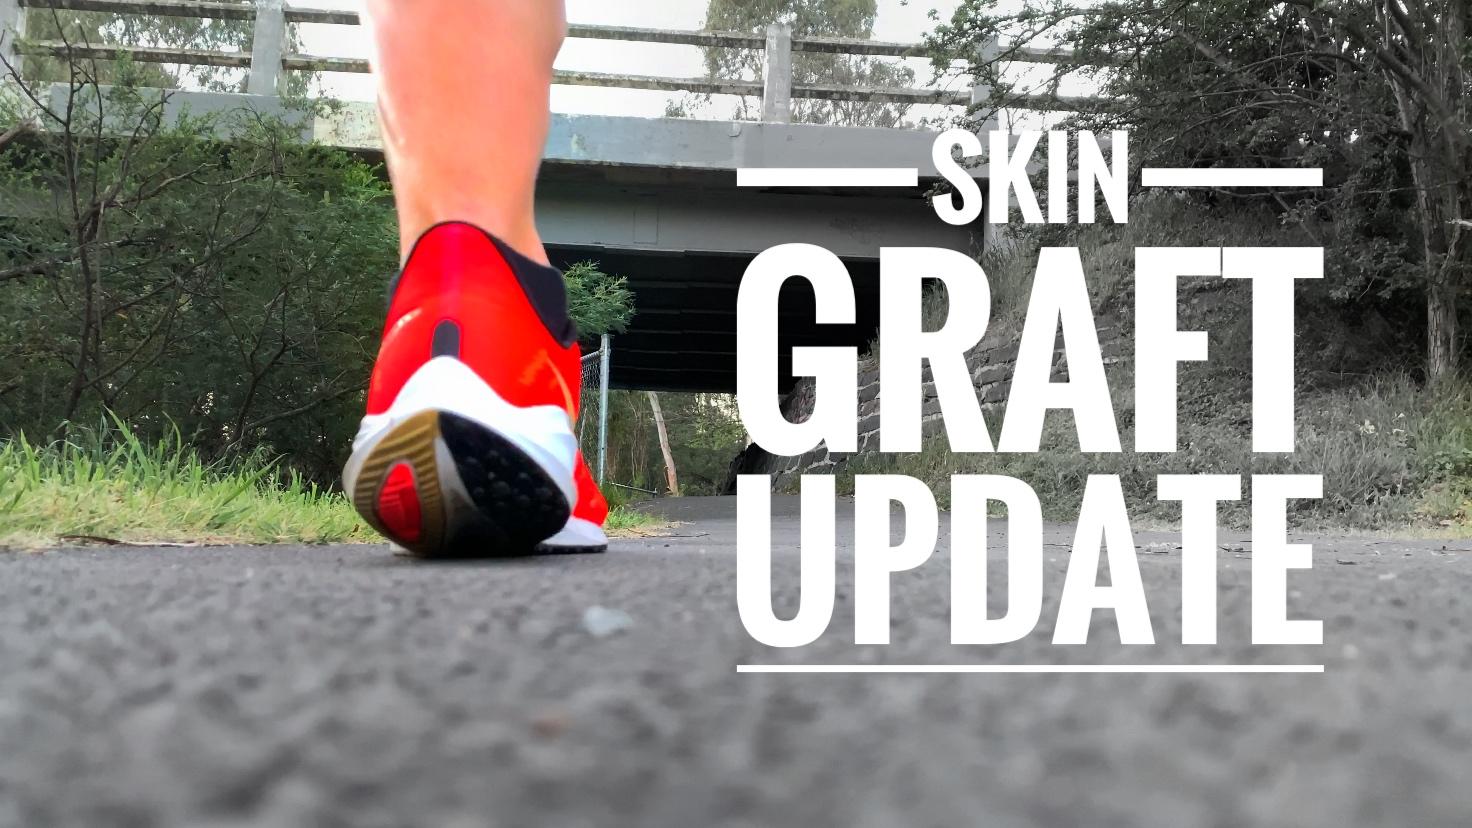 Skin Graft Update: 5 Weeks After Melanoma Surgery